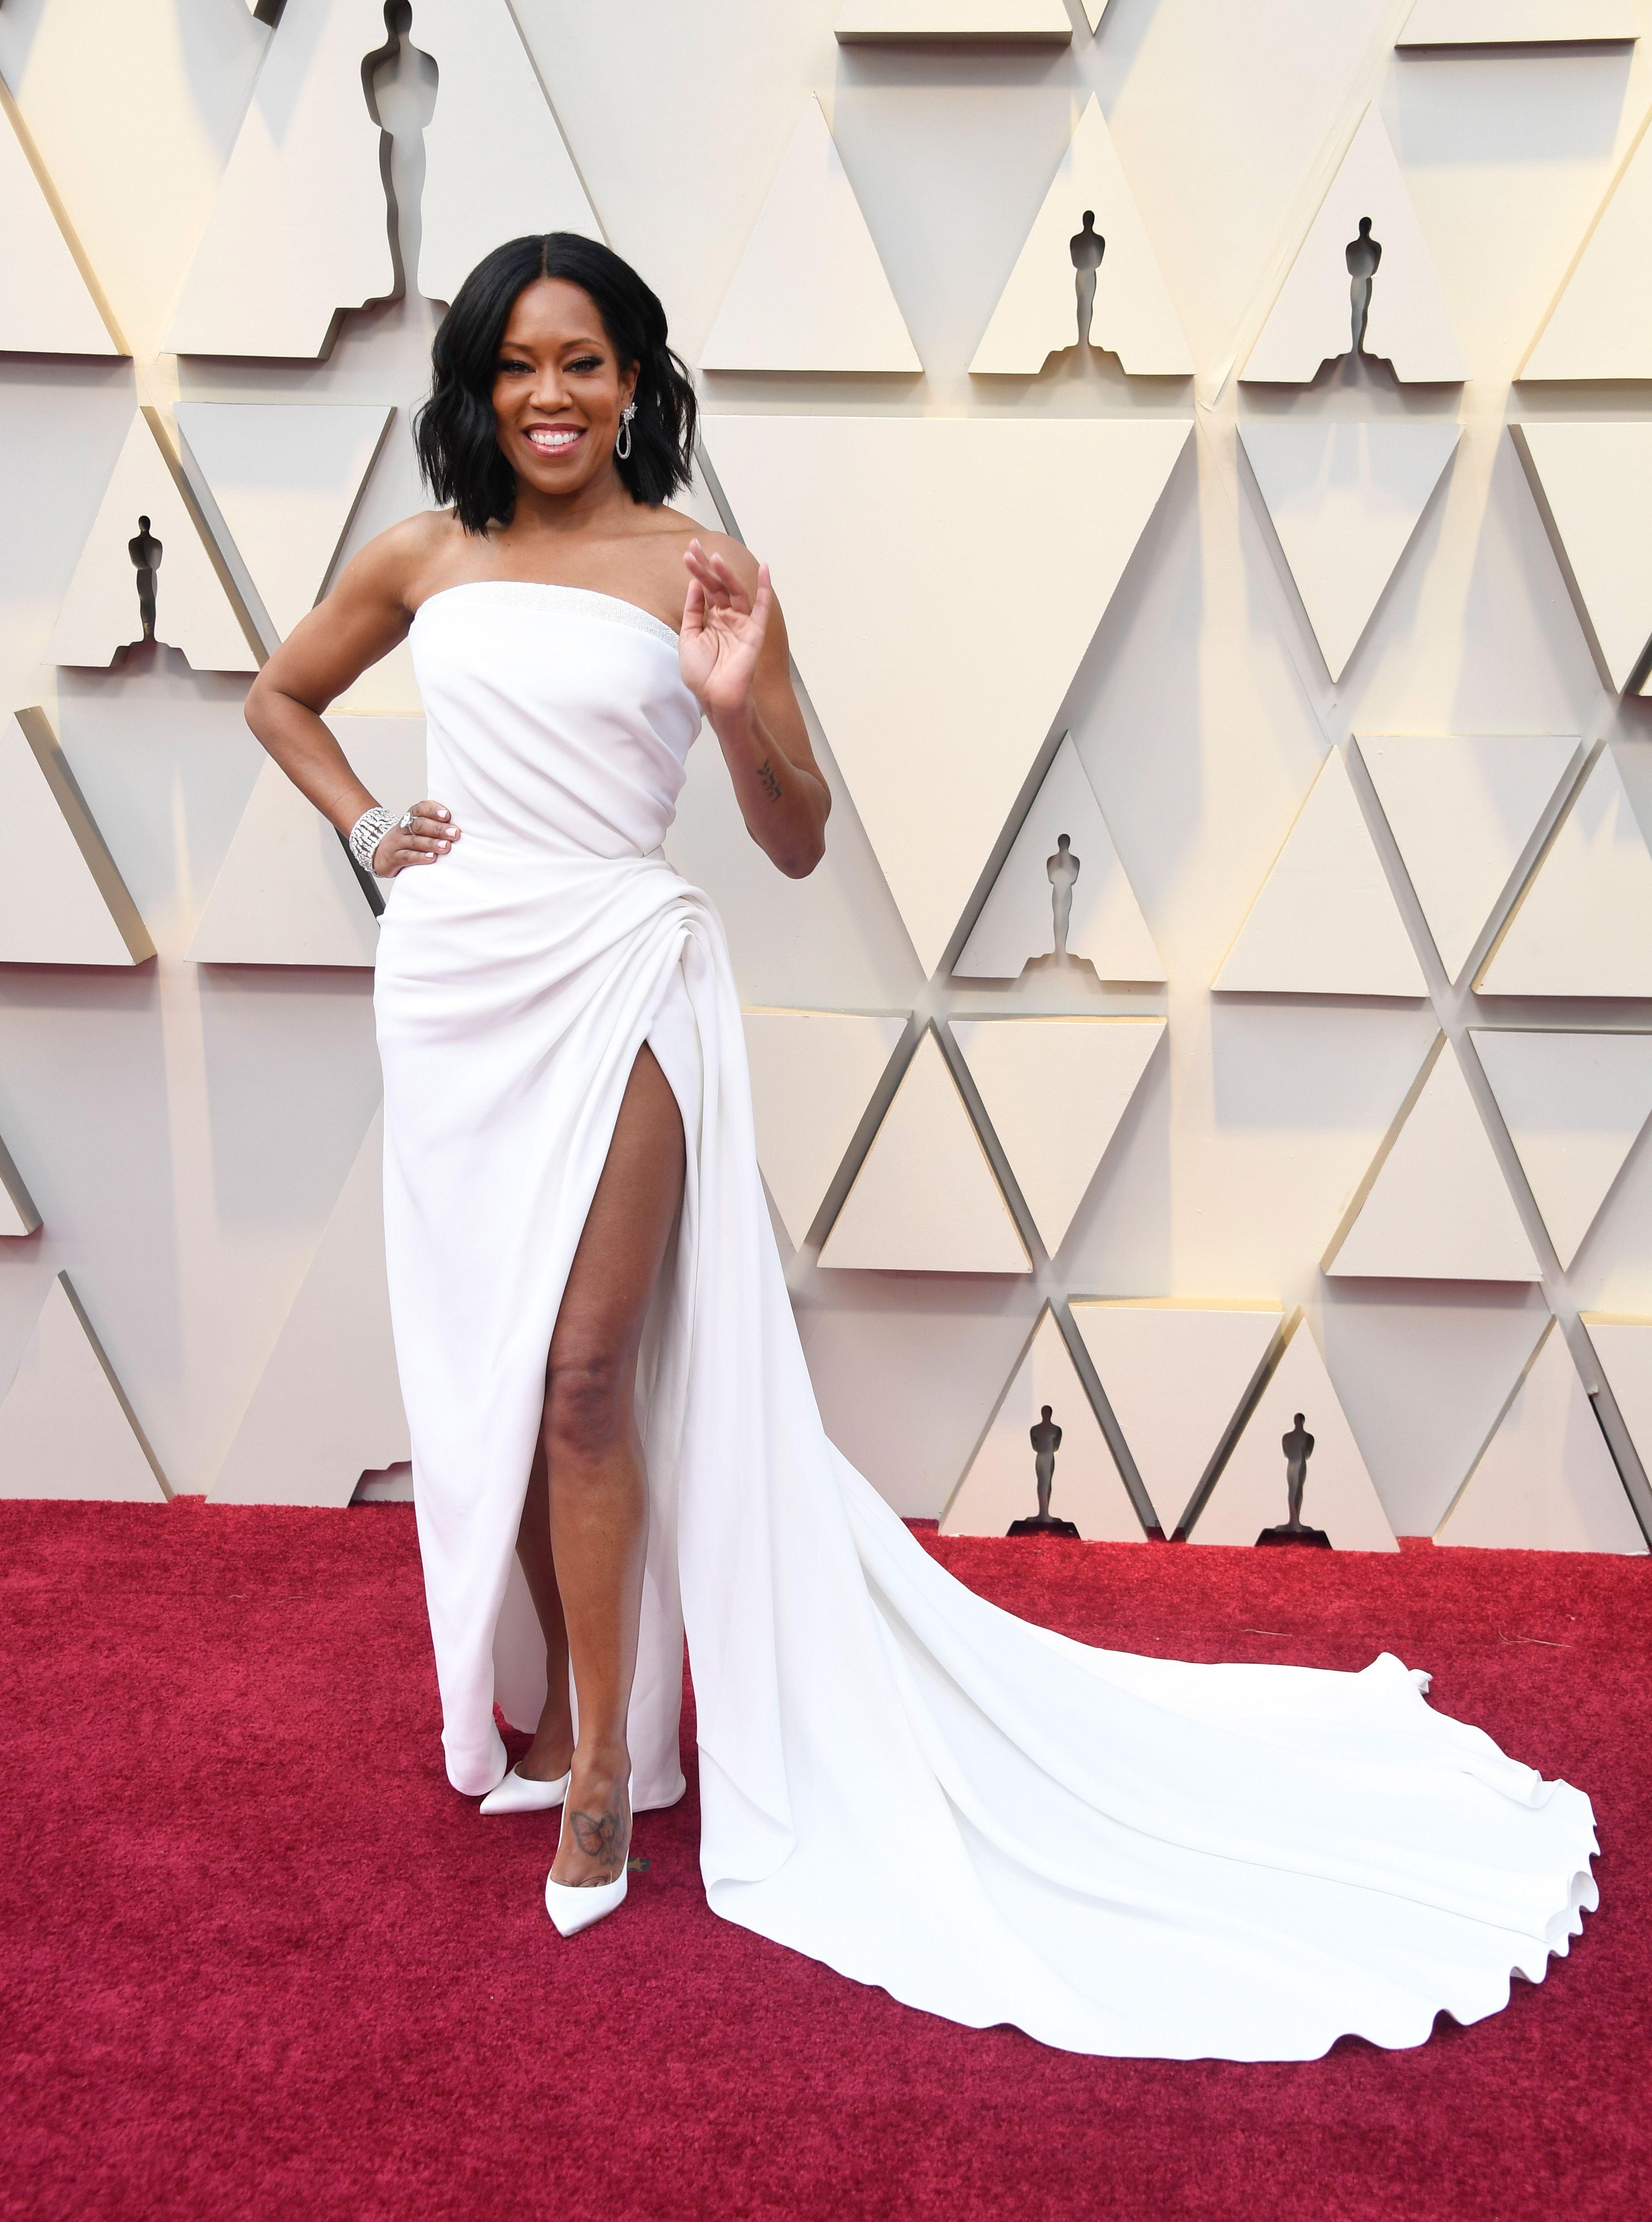 91st Annual Academy Awards - Arrivals - Regina King